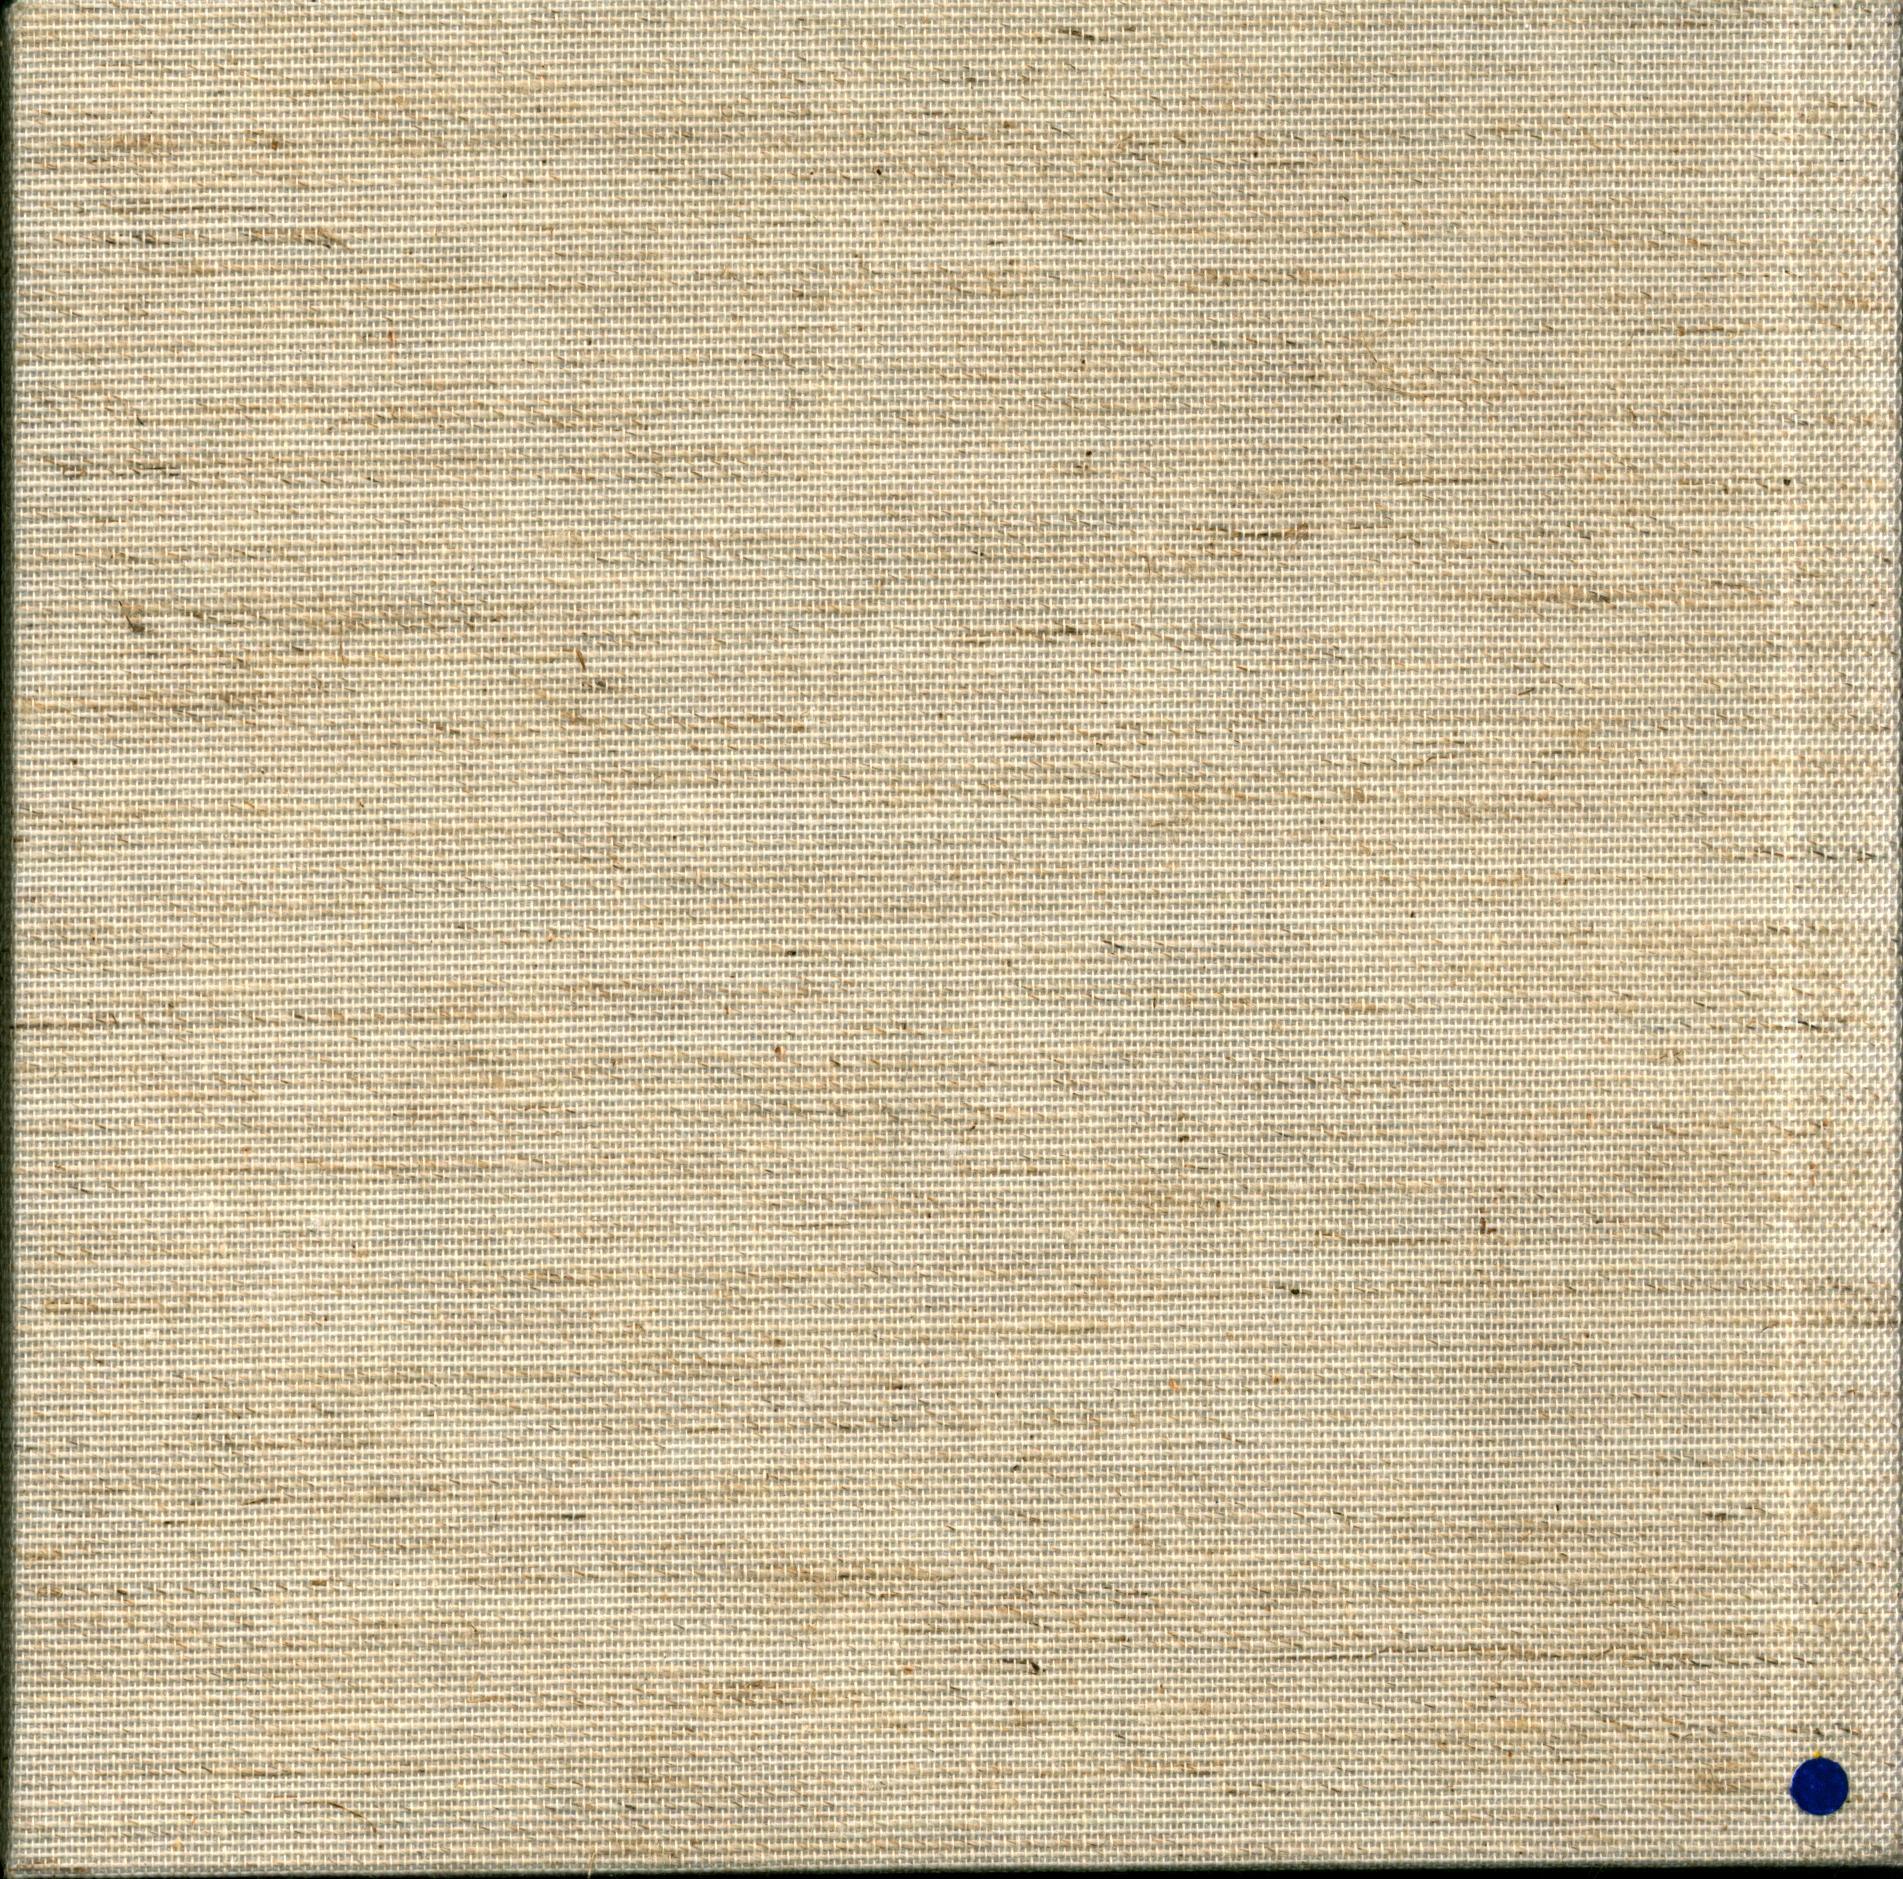 BookScanCenter_1-2.jpg